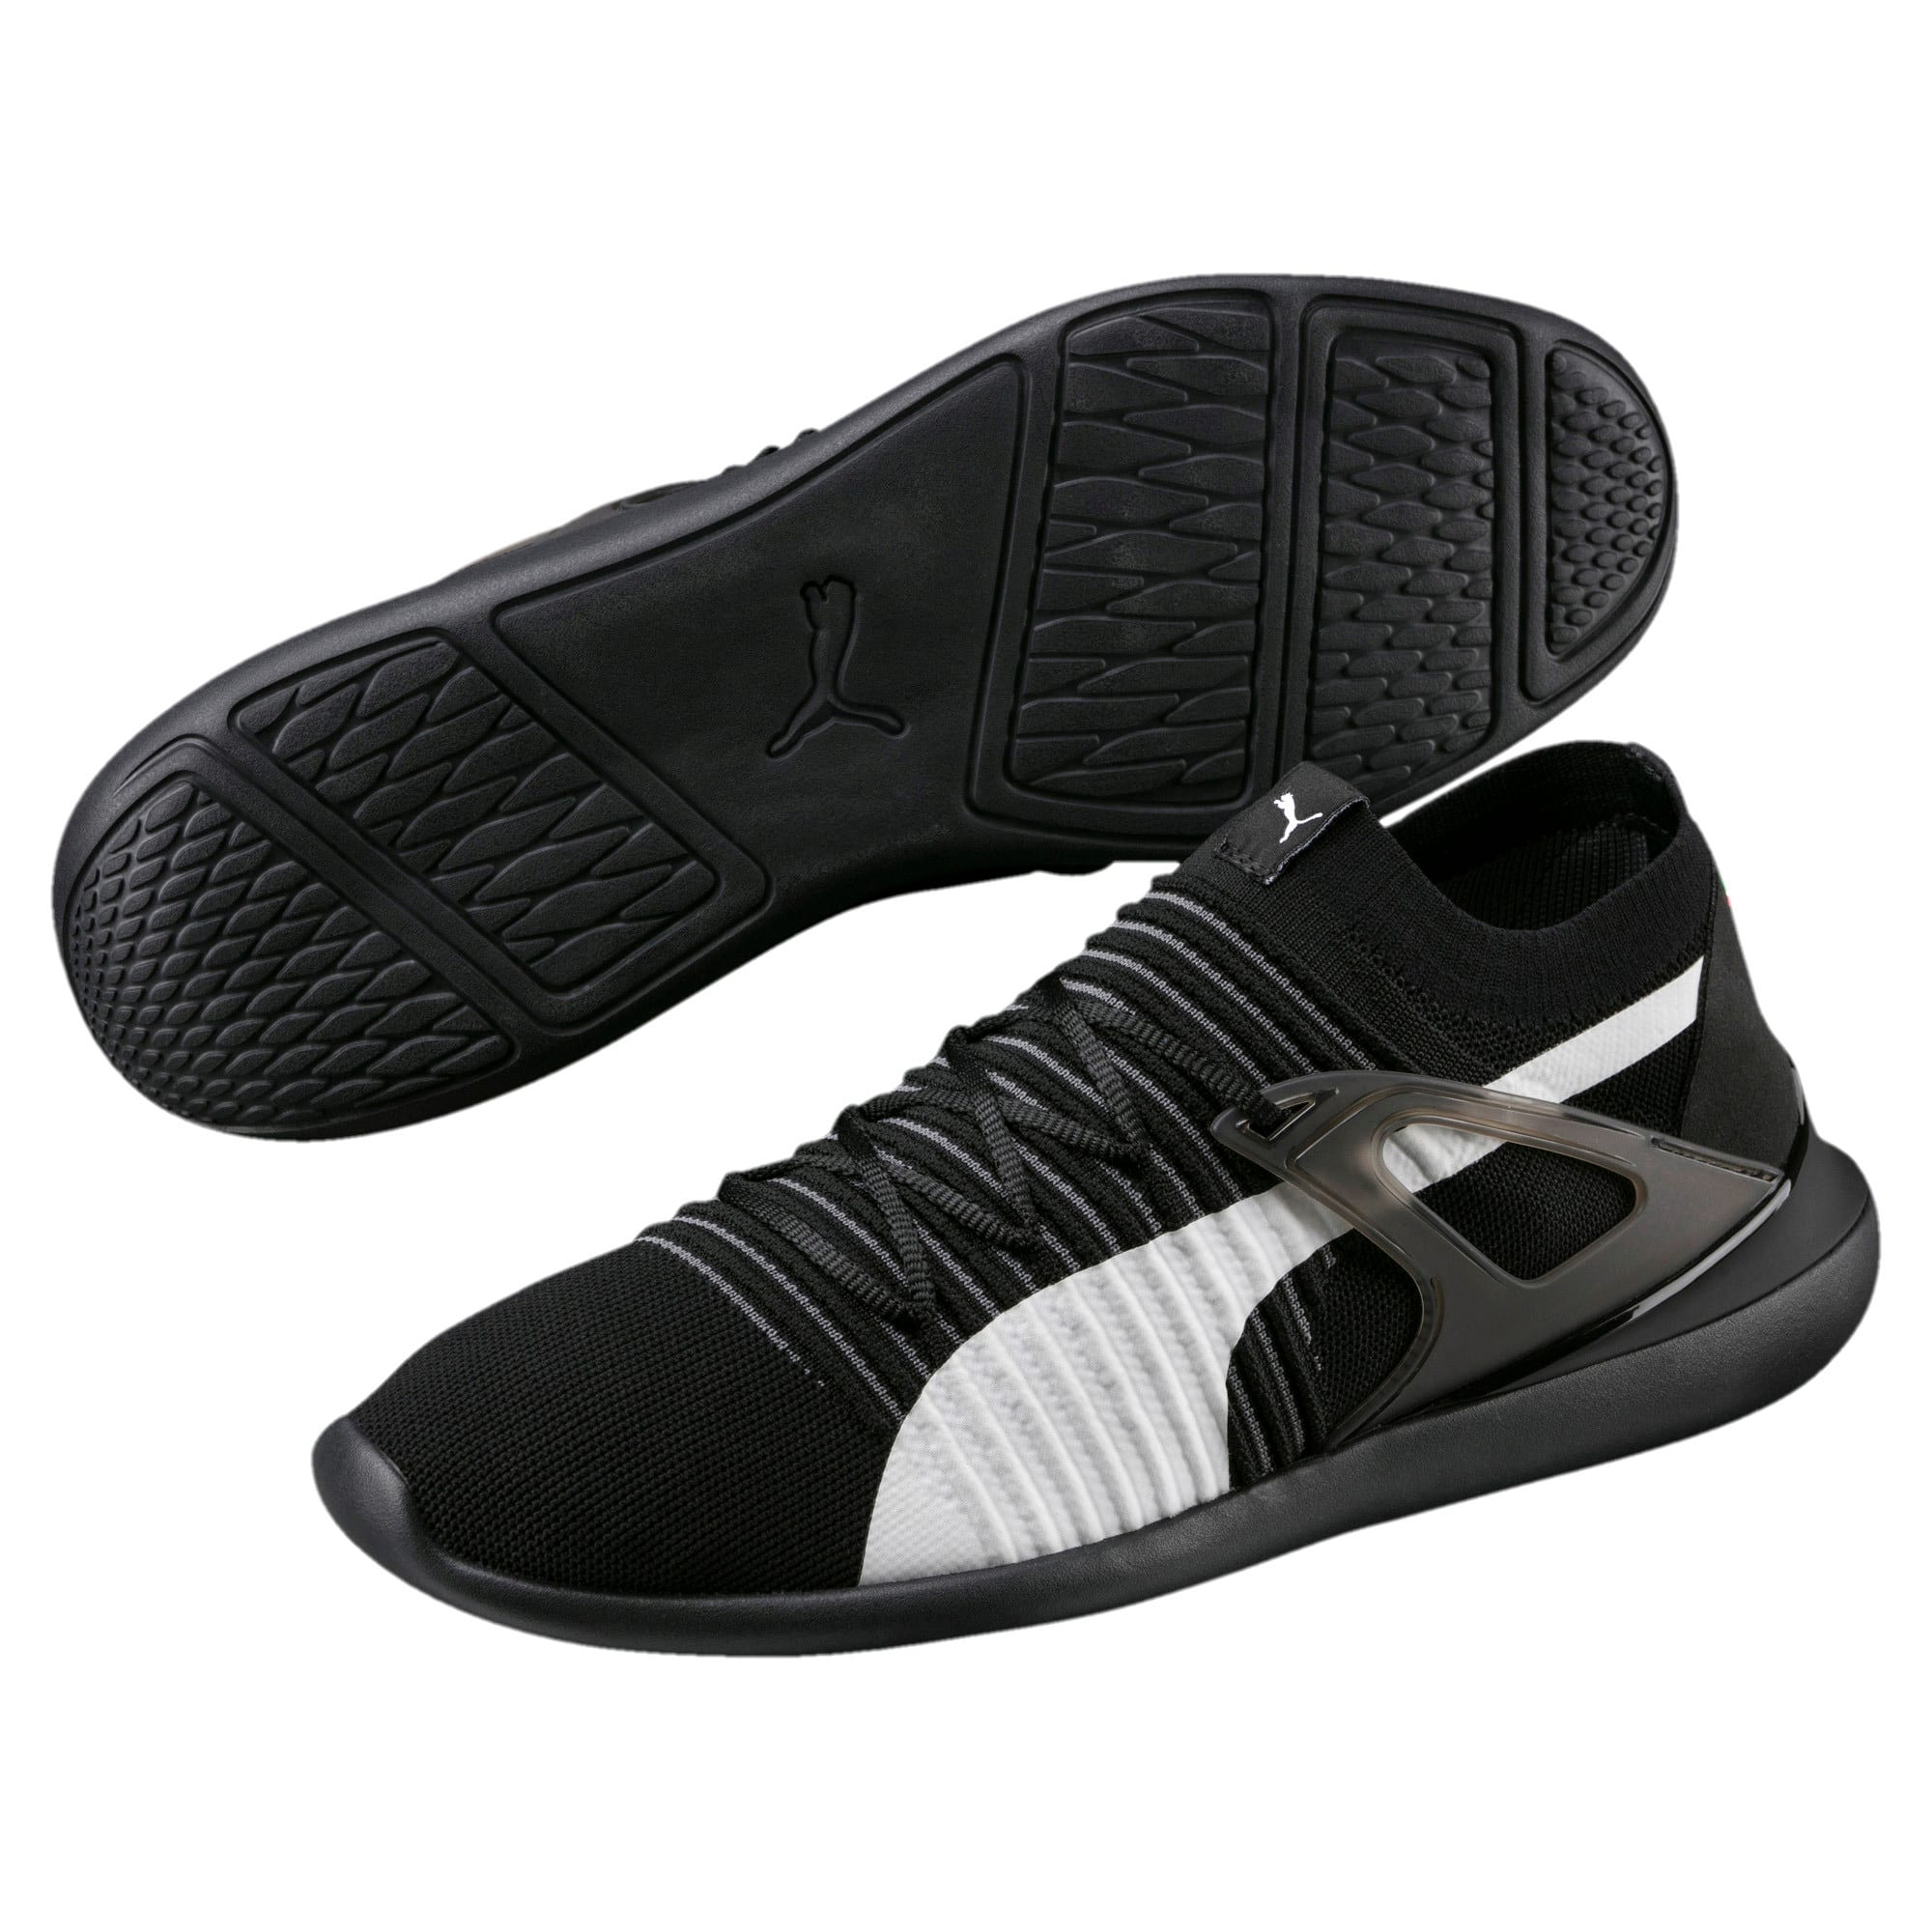 Thumbnail 2 of Ferrari Evo Cat Sock Lace Trainers, Puma Black-Puma White-Black, medium-IND